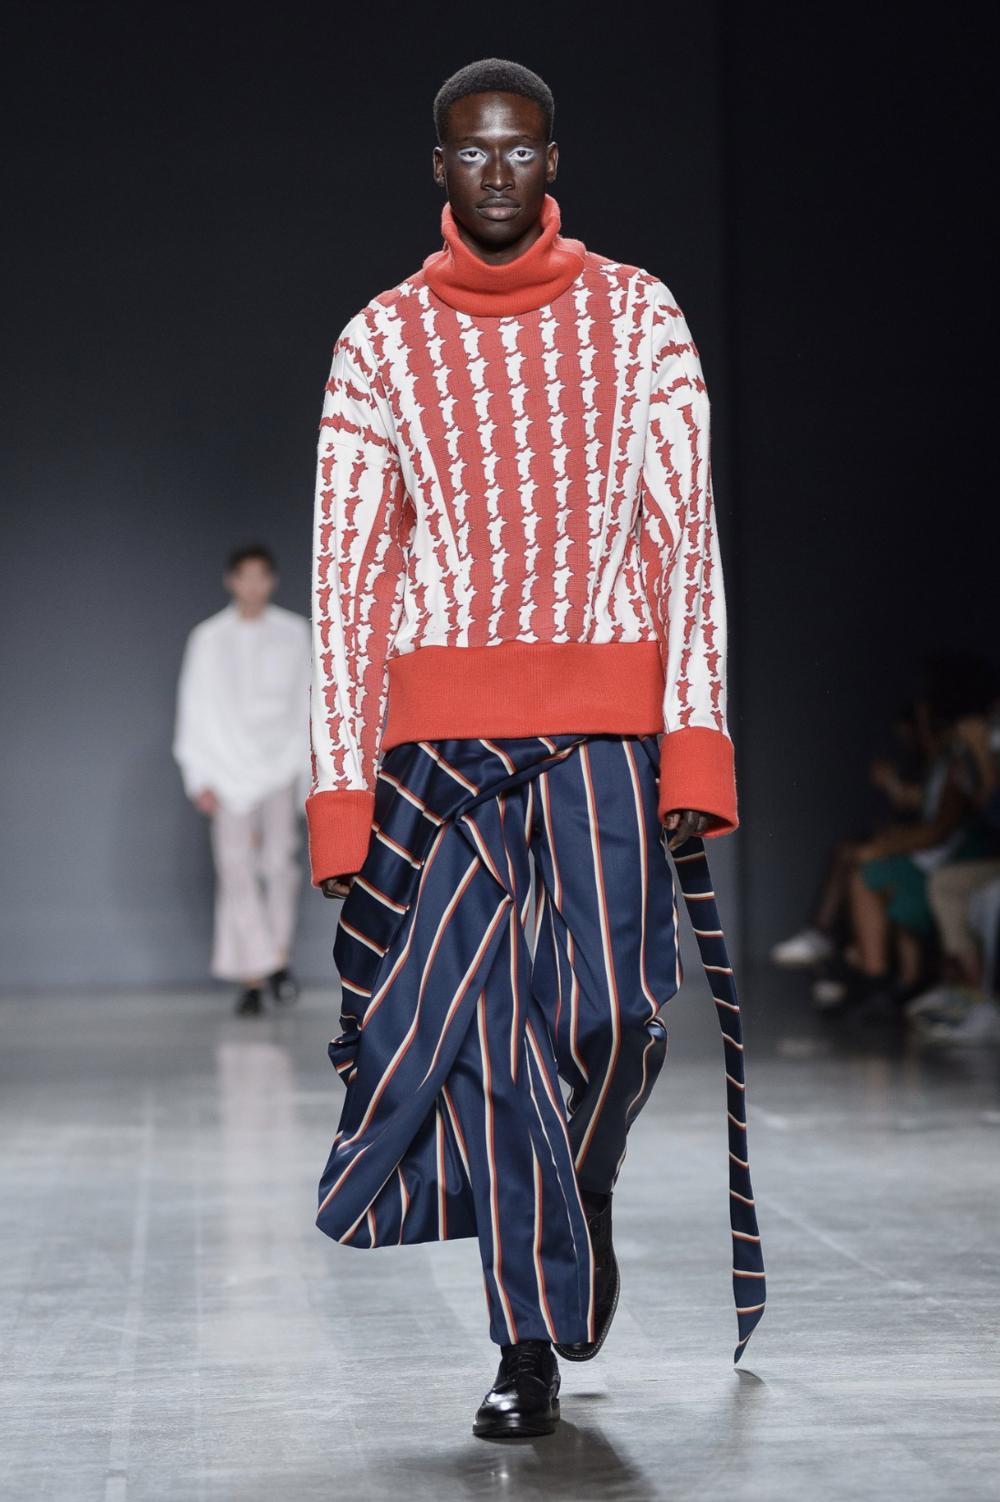 Taliah Leslie - Fashion Designer